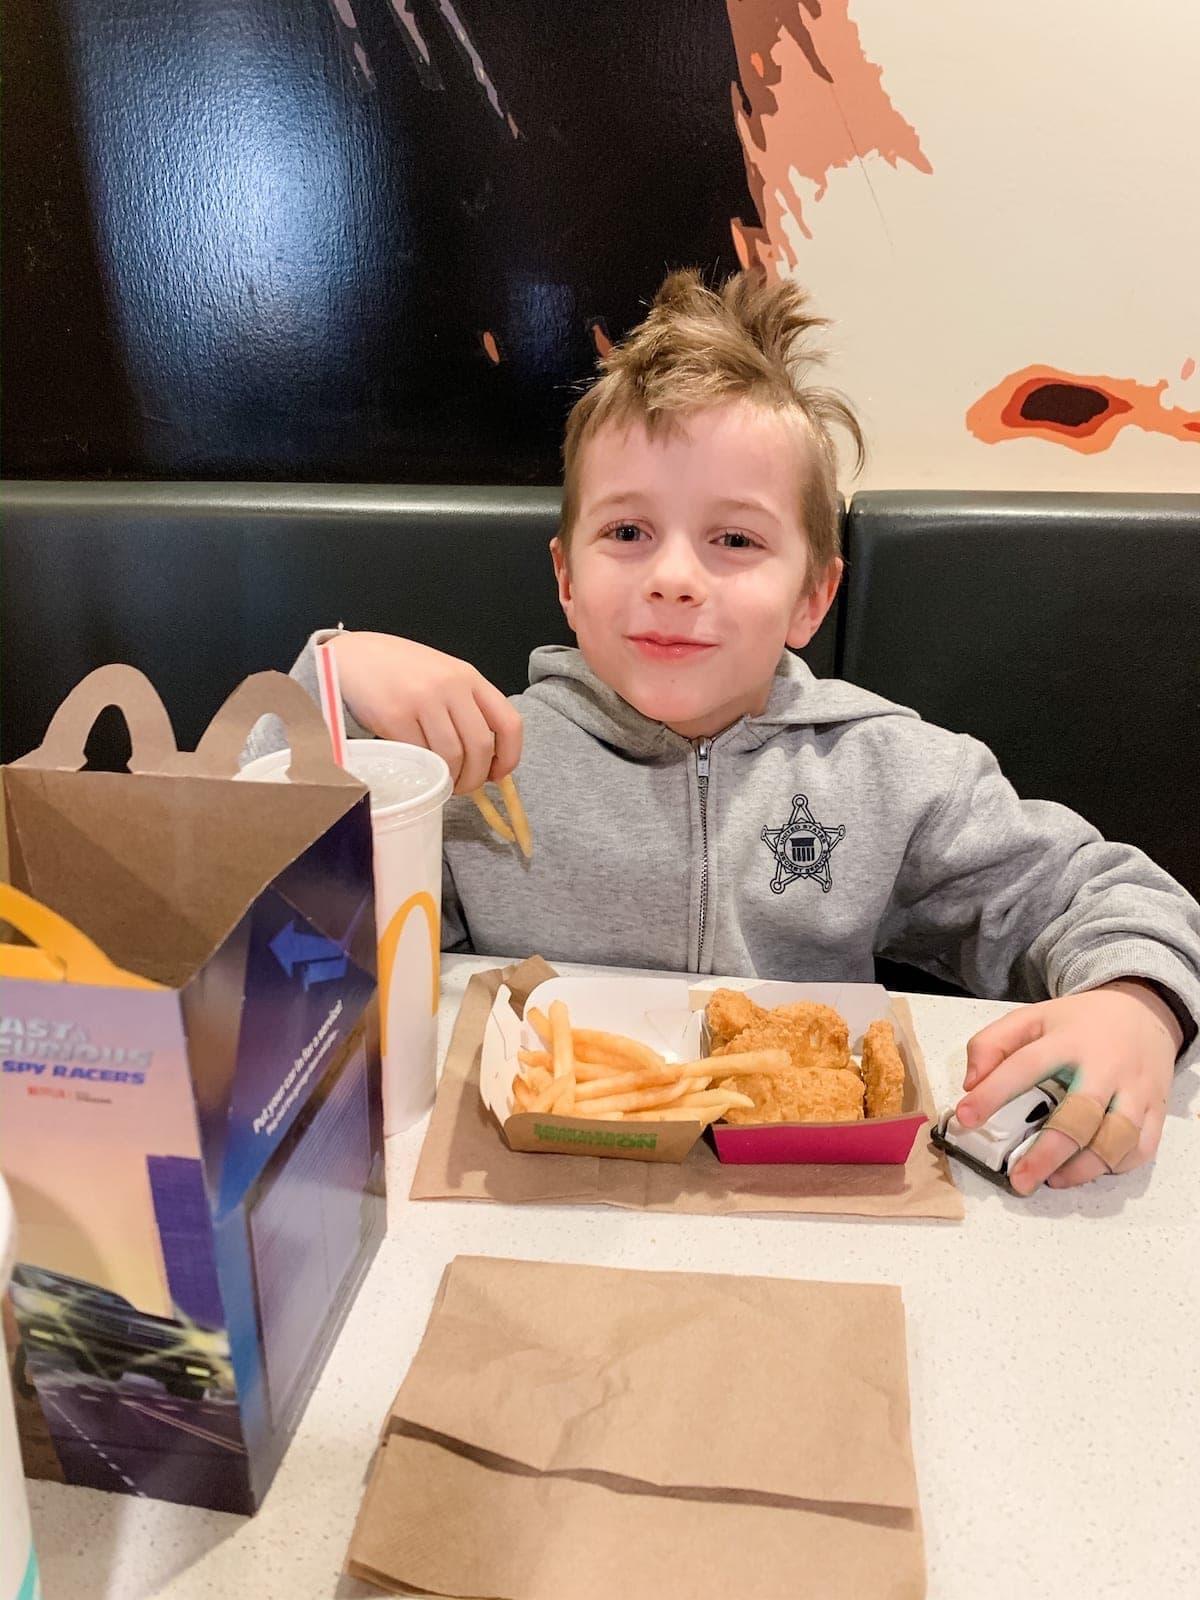 Blake sitting at a table eating McDonalds